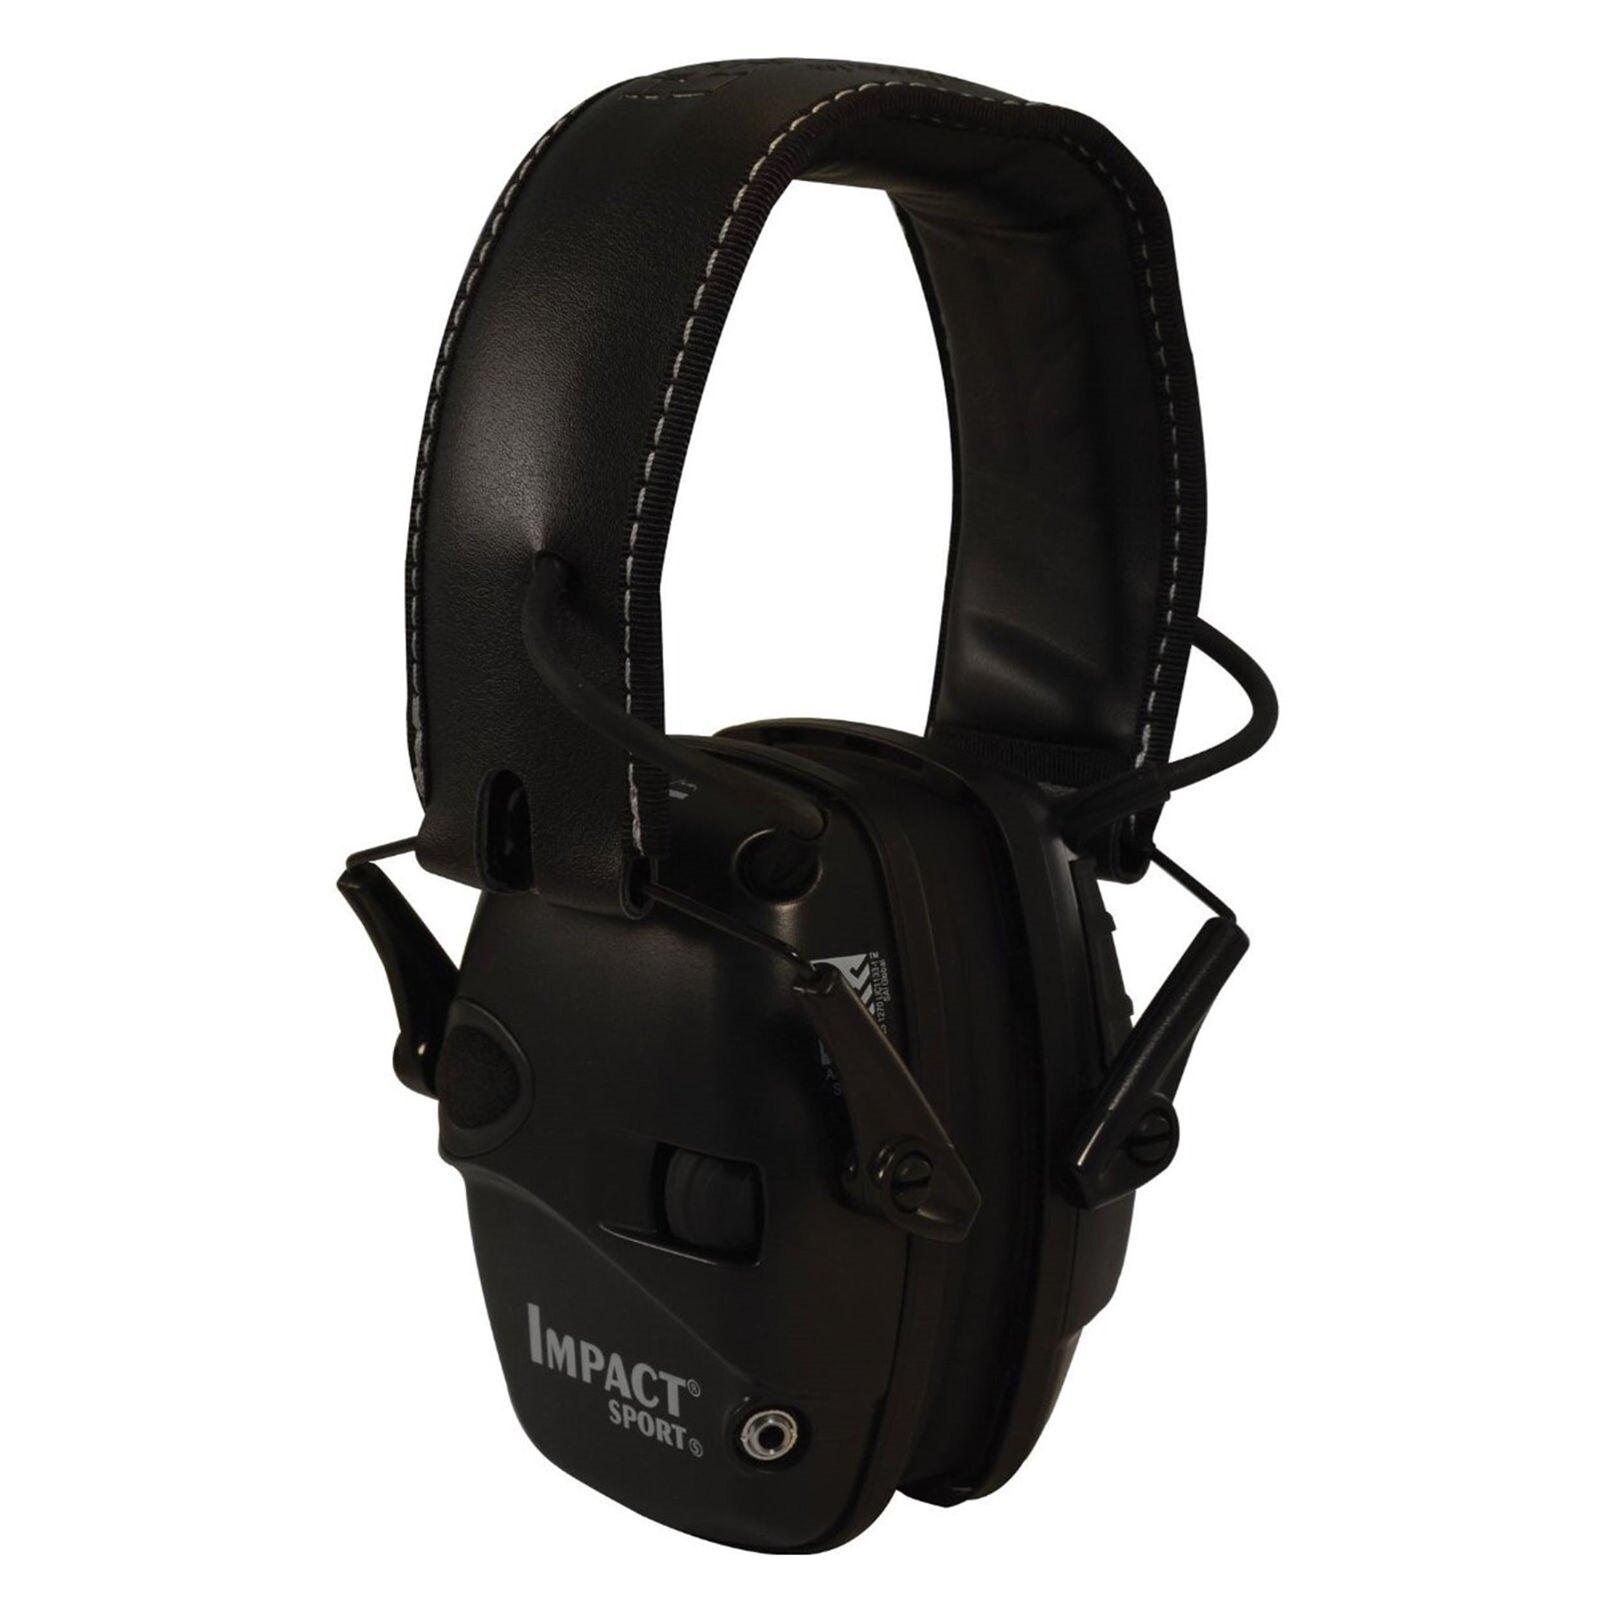 Elektronické slúchadlá Impact SPORT® Howard Leight Honeywell® - čierna (Farba: Čierna)